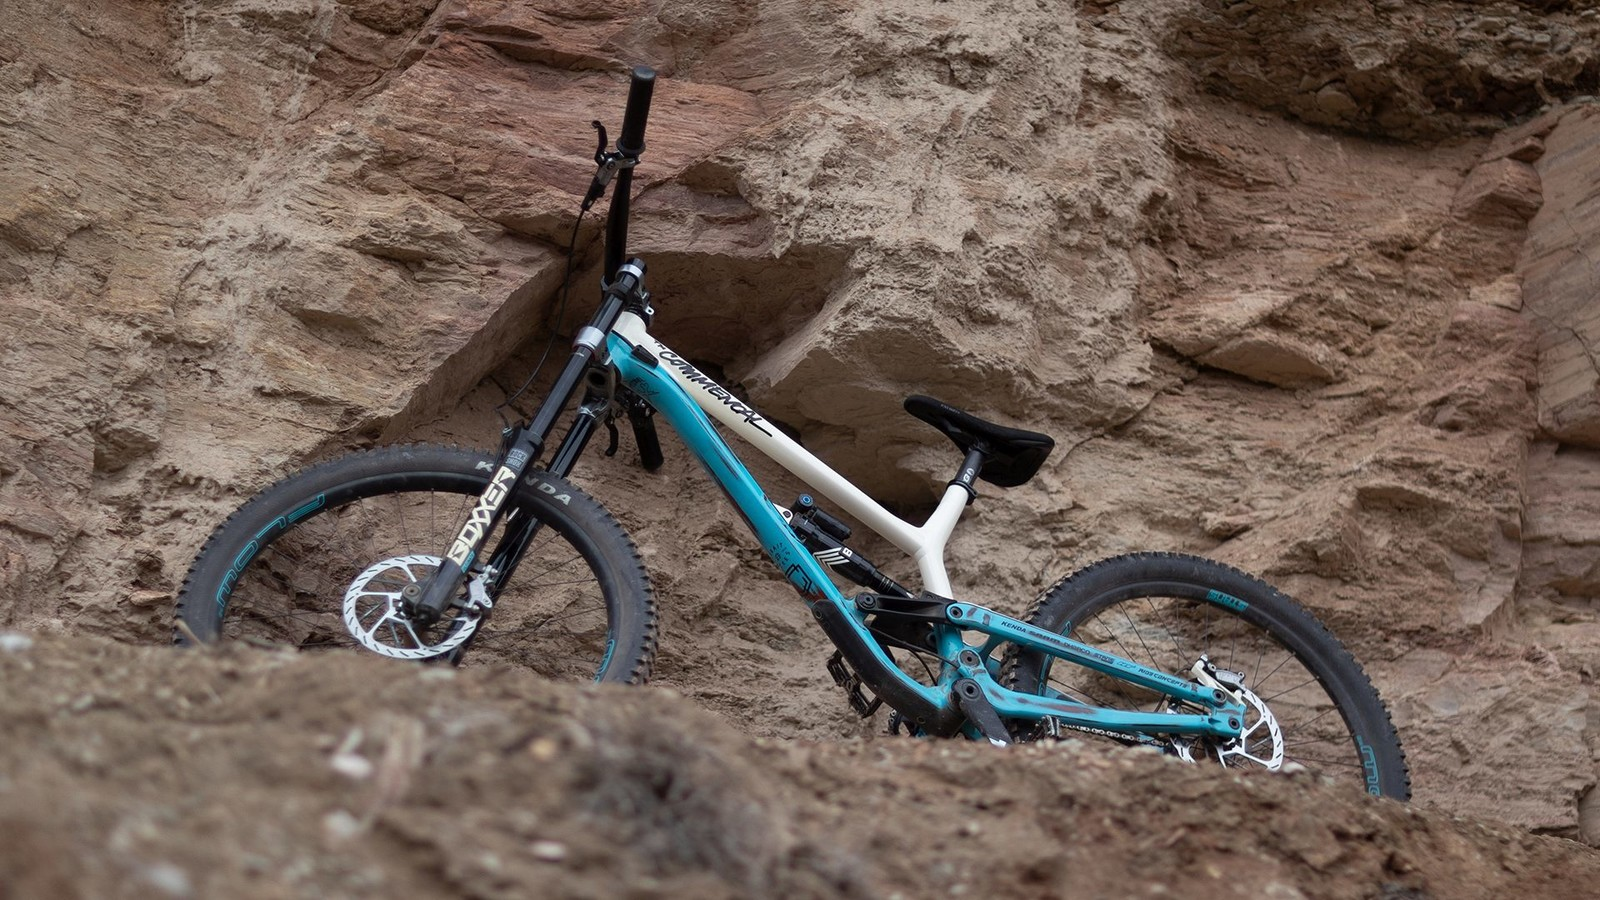 Pro Bike Check: Kyle Strait's Custom Commencal FRS for Rampage